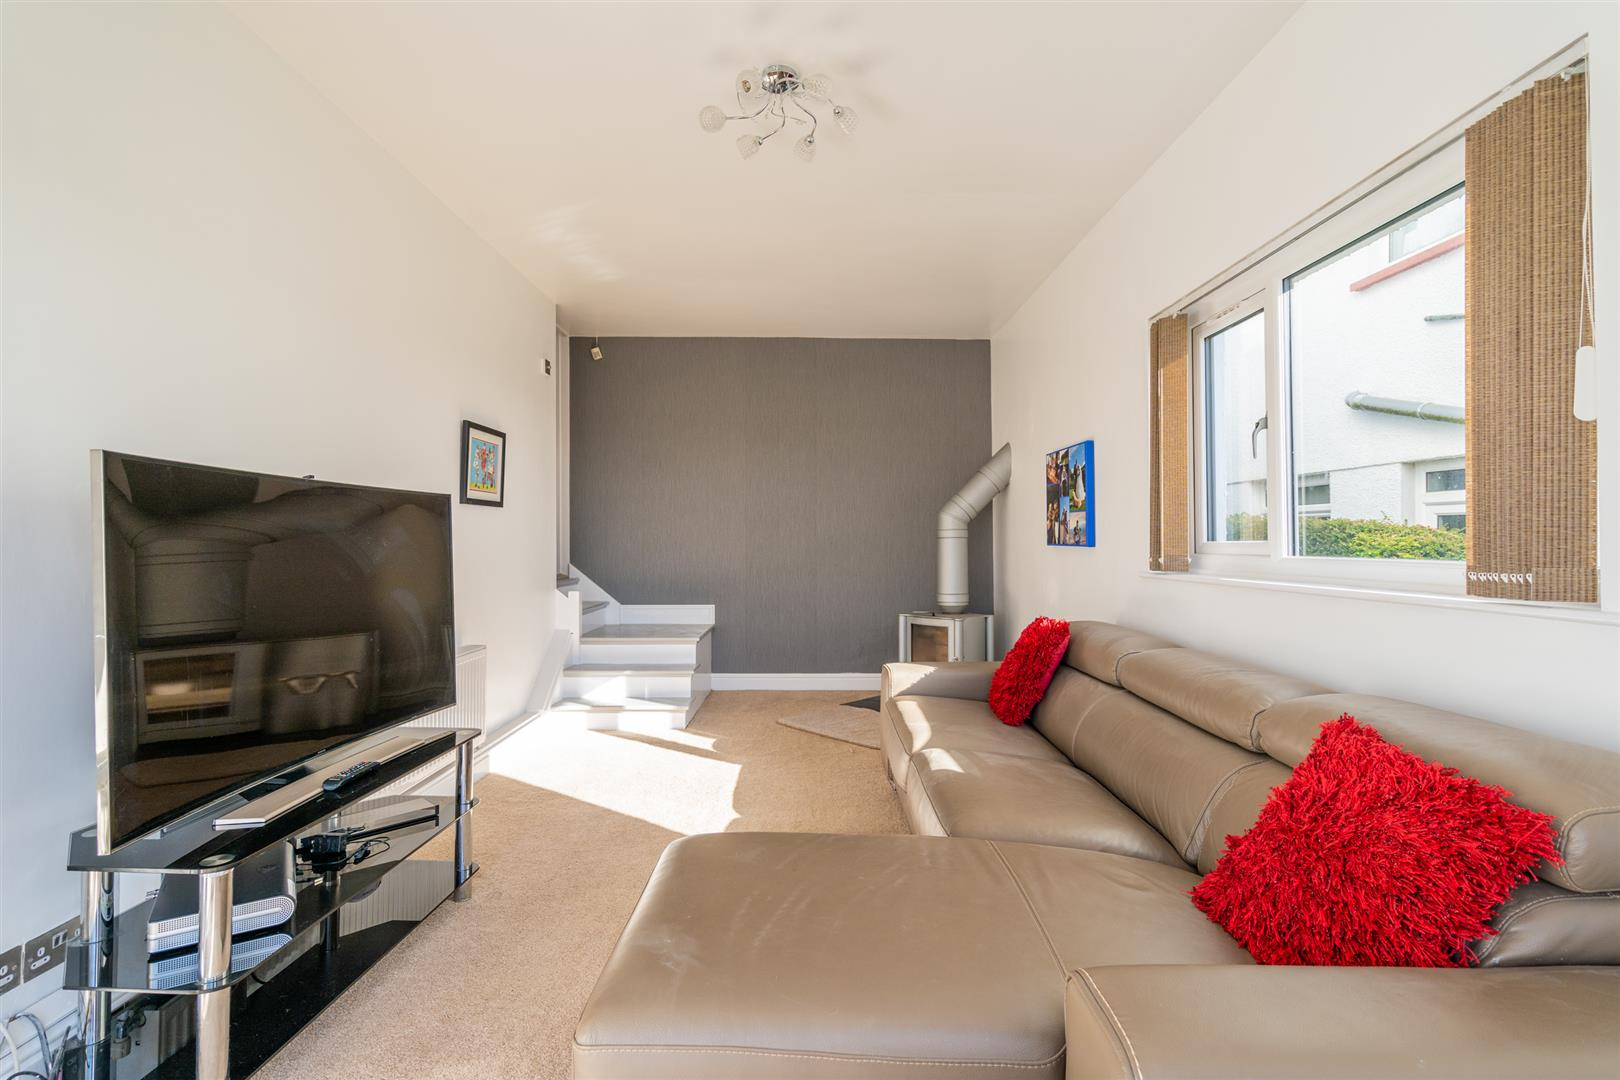 Westport Avenue, Mayals, Swansea, SA3 5EQ